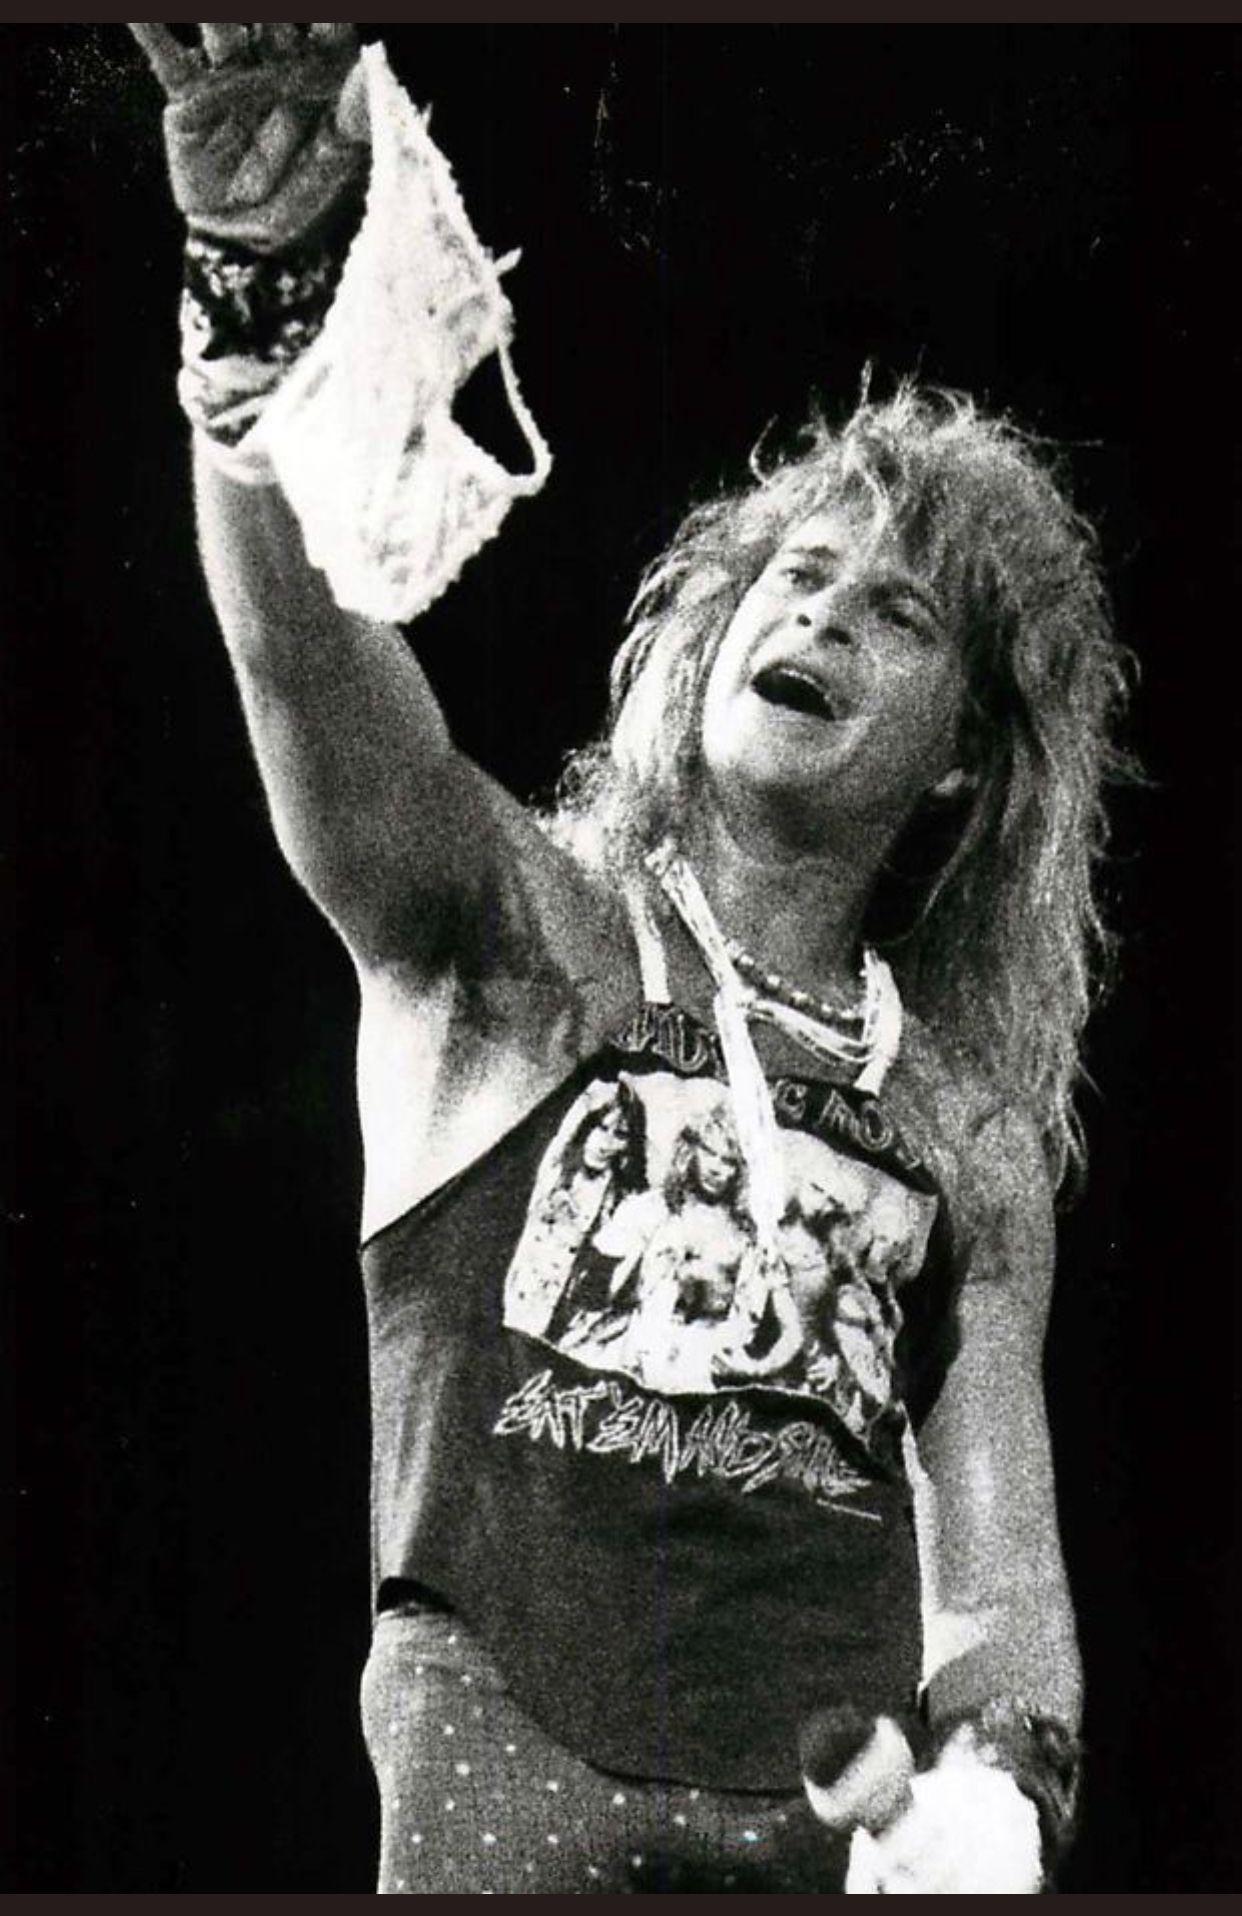 Pin By Rocky On The Mighty Vh Van Halen Black Sabbath Rock N Roll